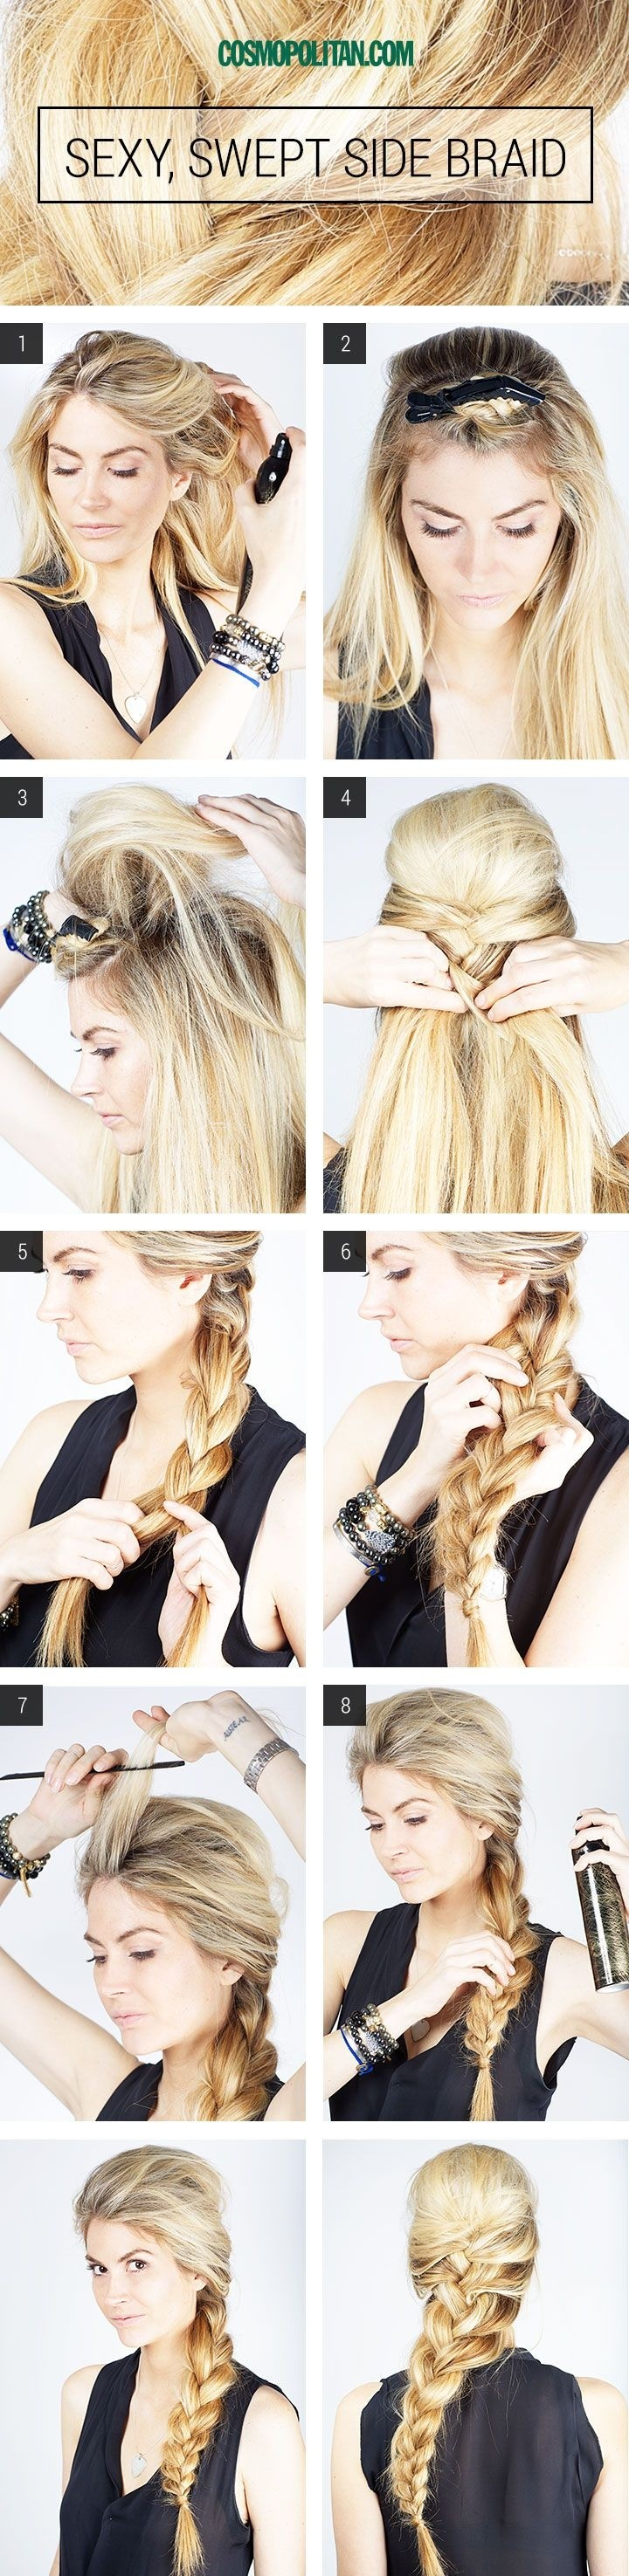 Pleasing 10 French Braids Hairstyles Tutorials Everyday Hair Styles Hairstyles For Women Draintrainus